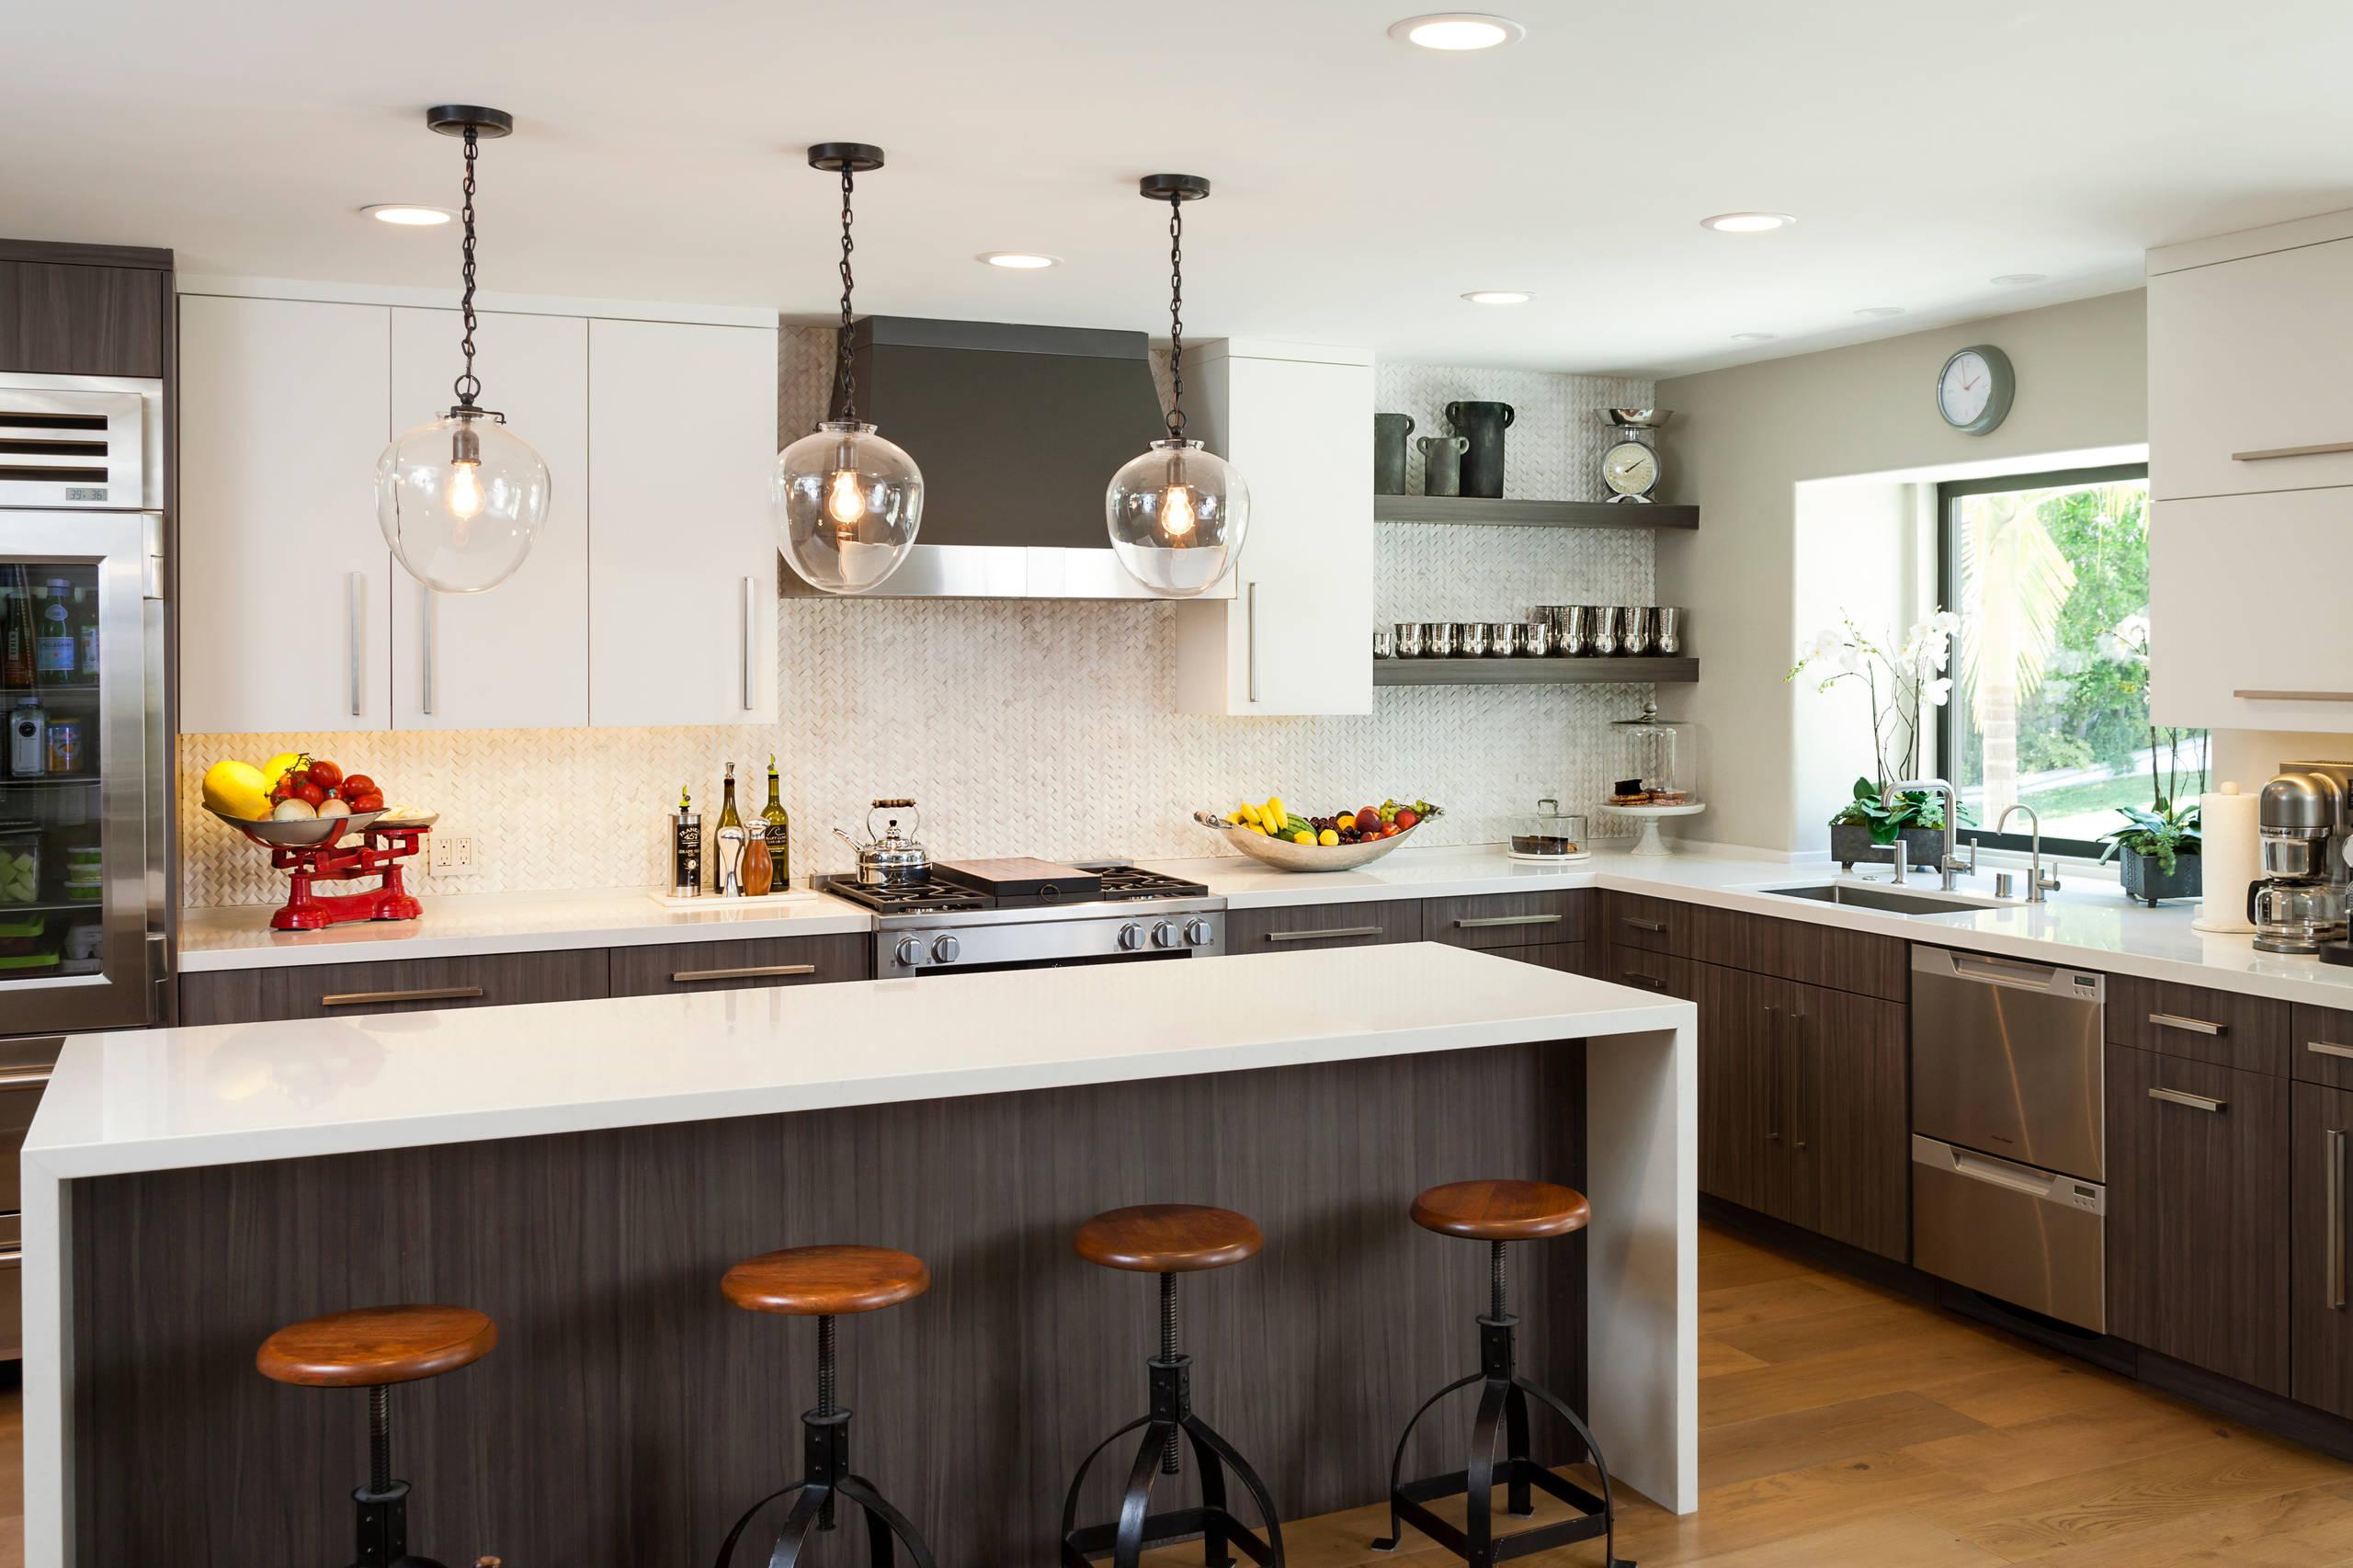 18 Hot Kitchen Renovation Tips & Designs That Will ... on Kitchen Renovation Ideas  id=77637